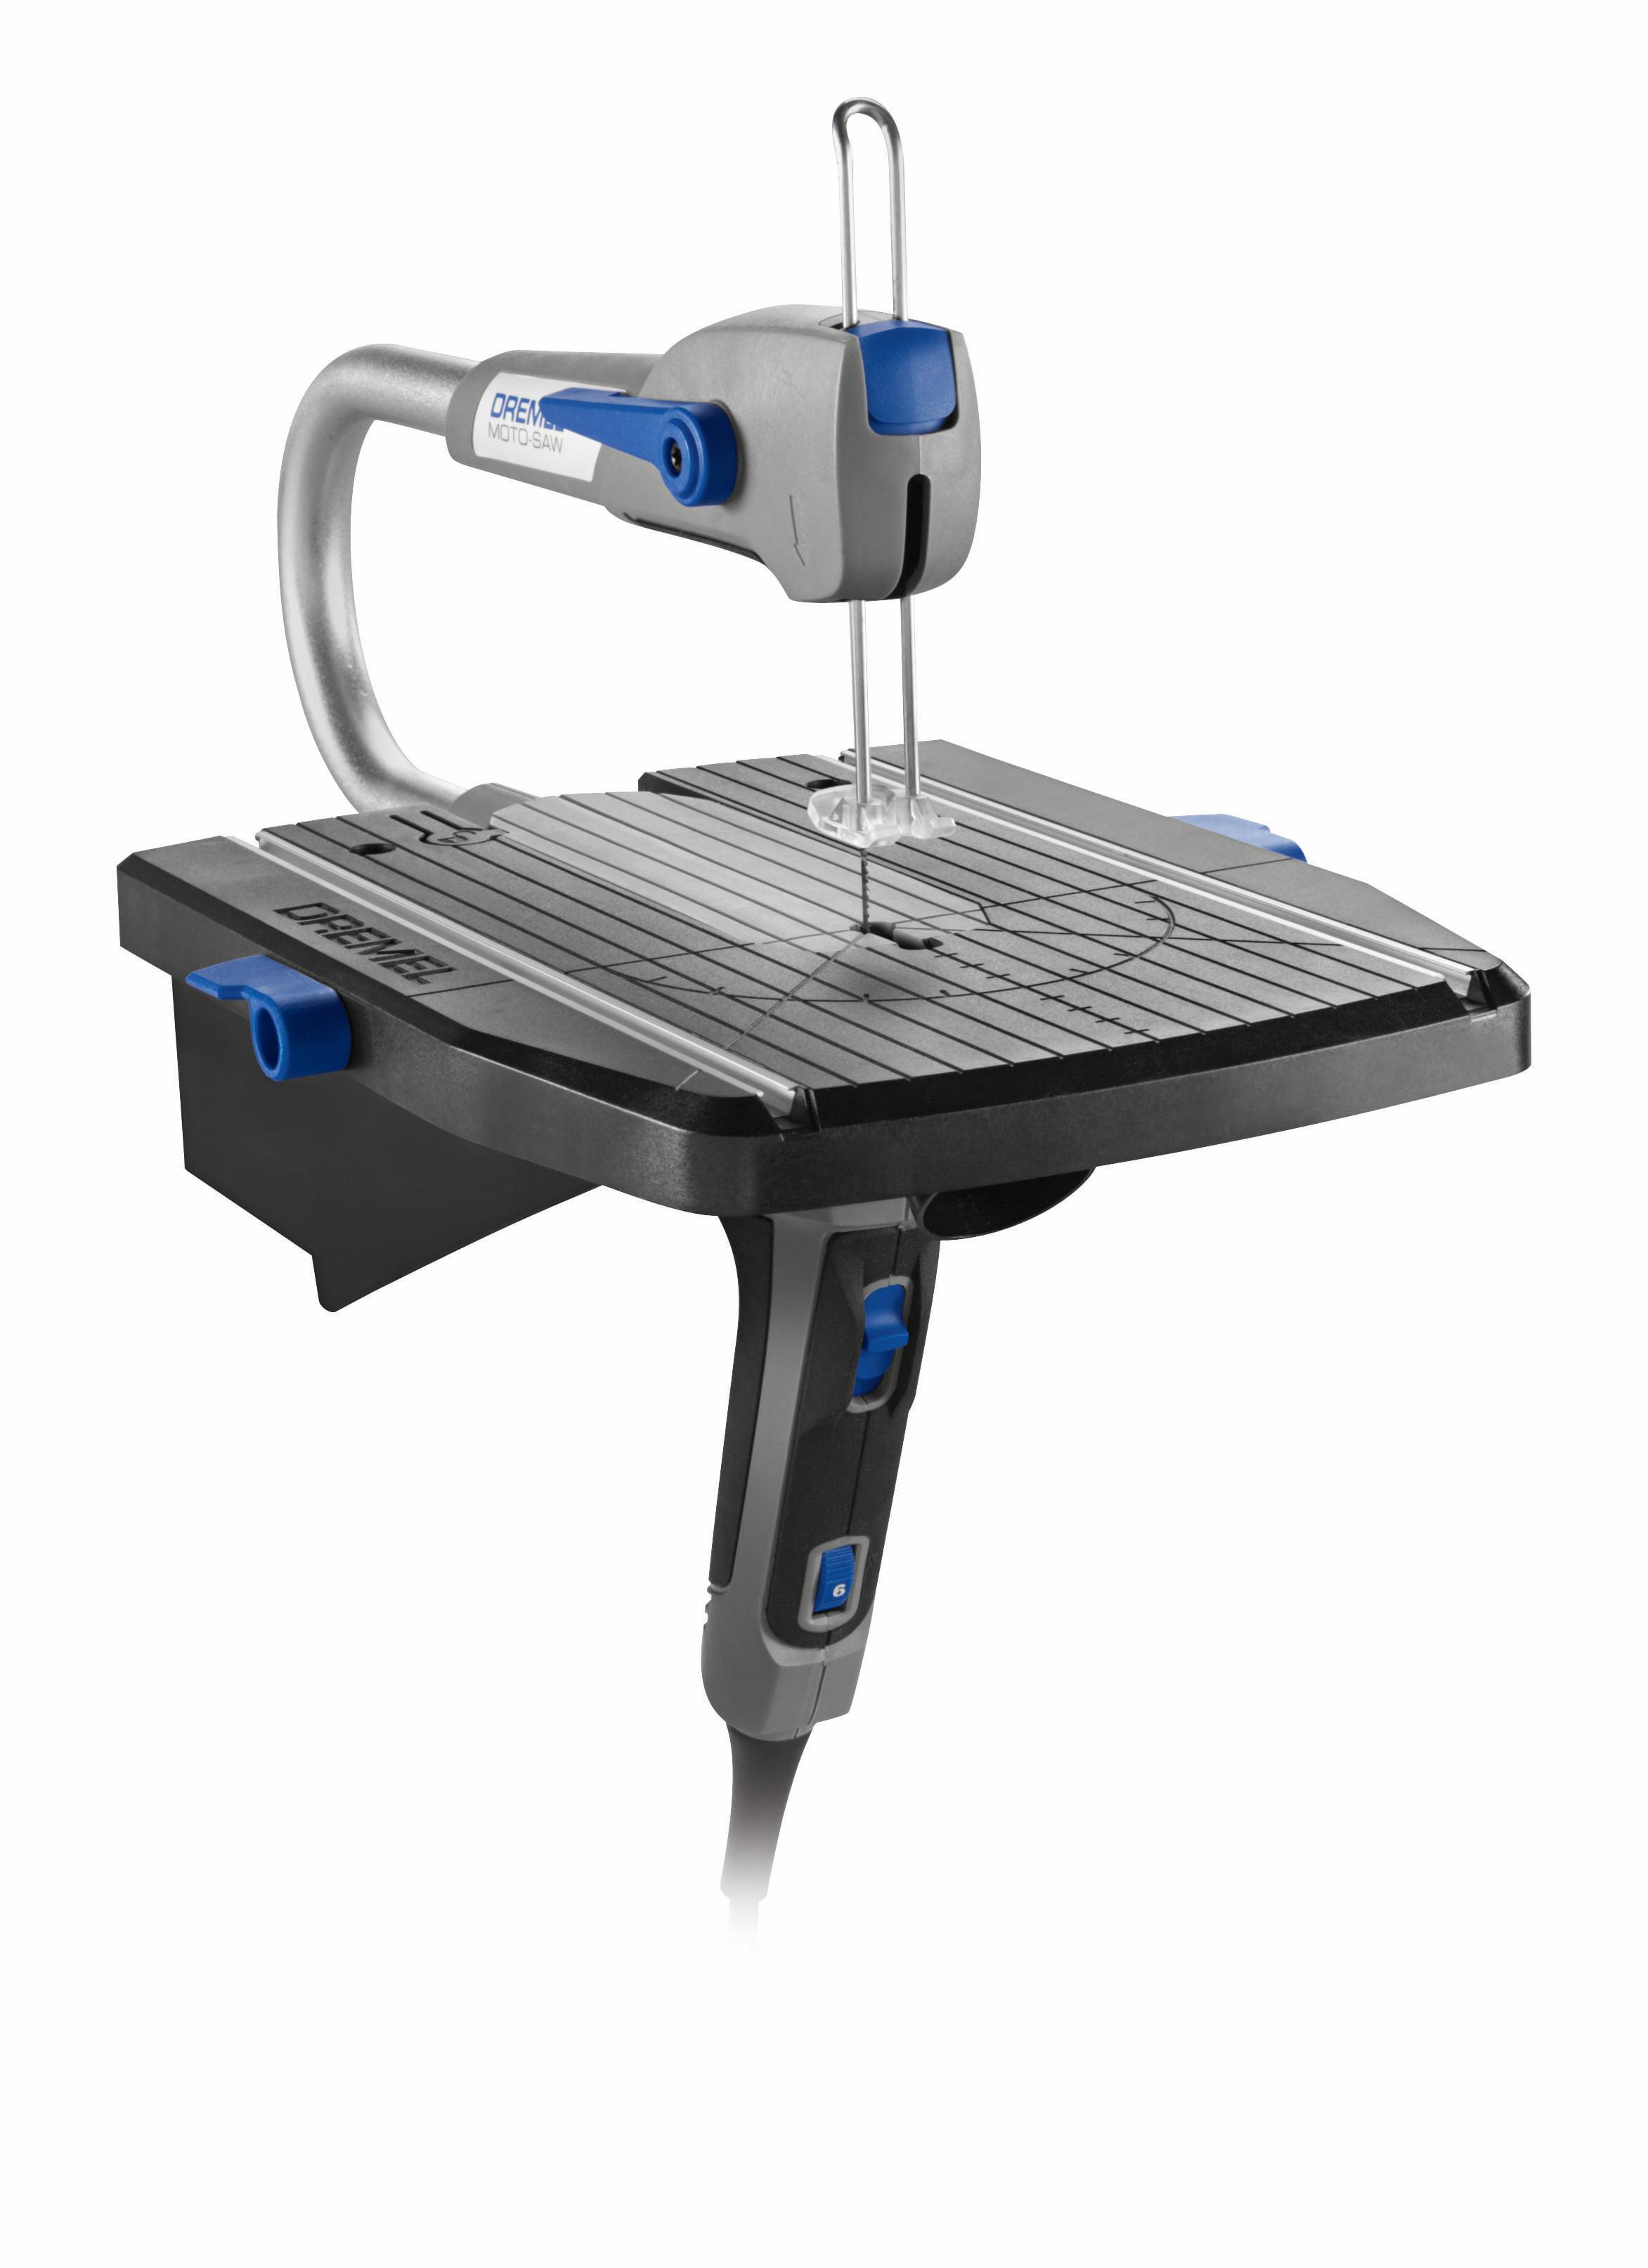 Dremel MS20-01 Moto-saw Kit by Robert Bosch Tool Corporation